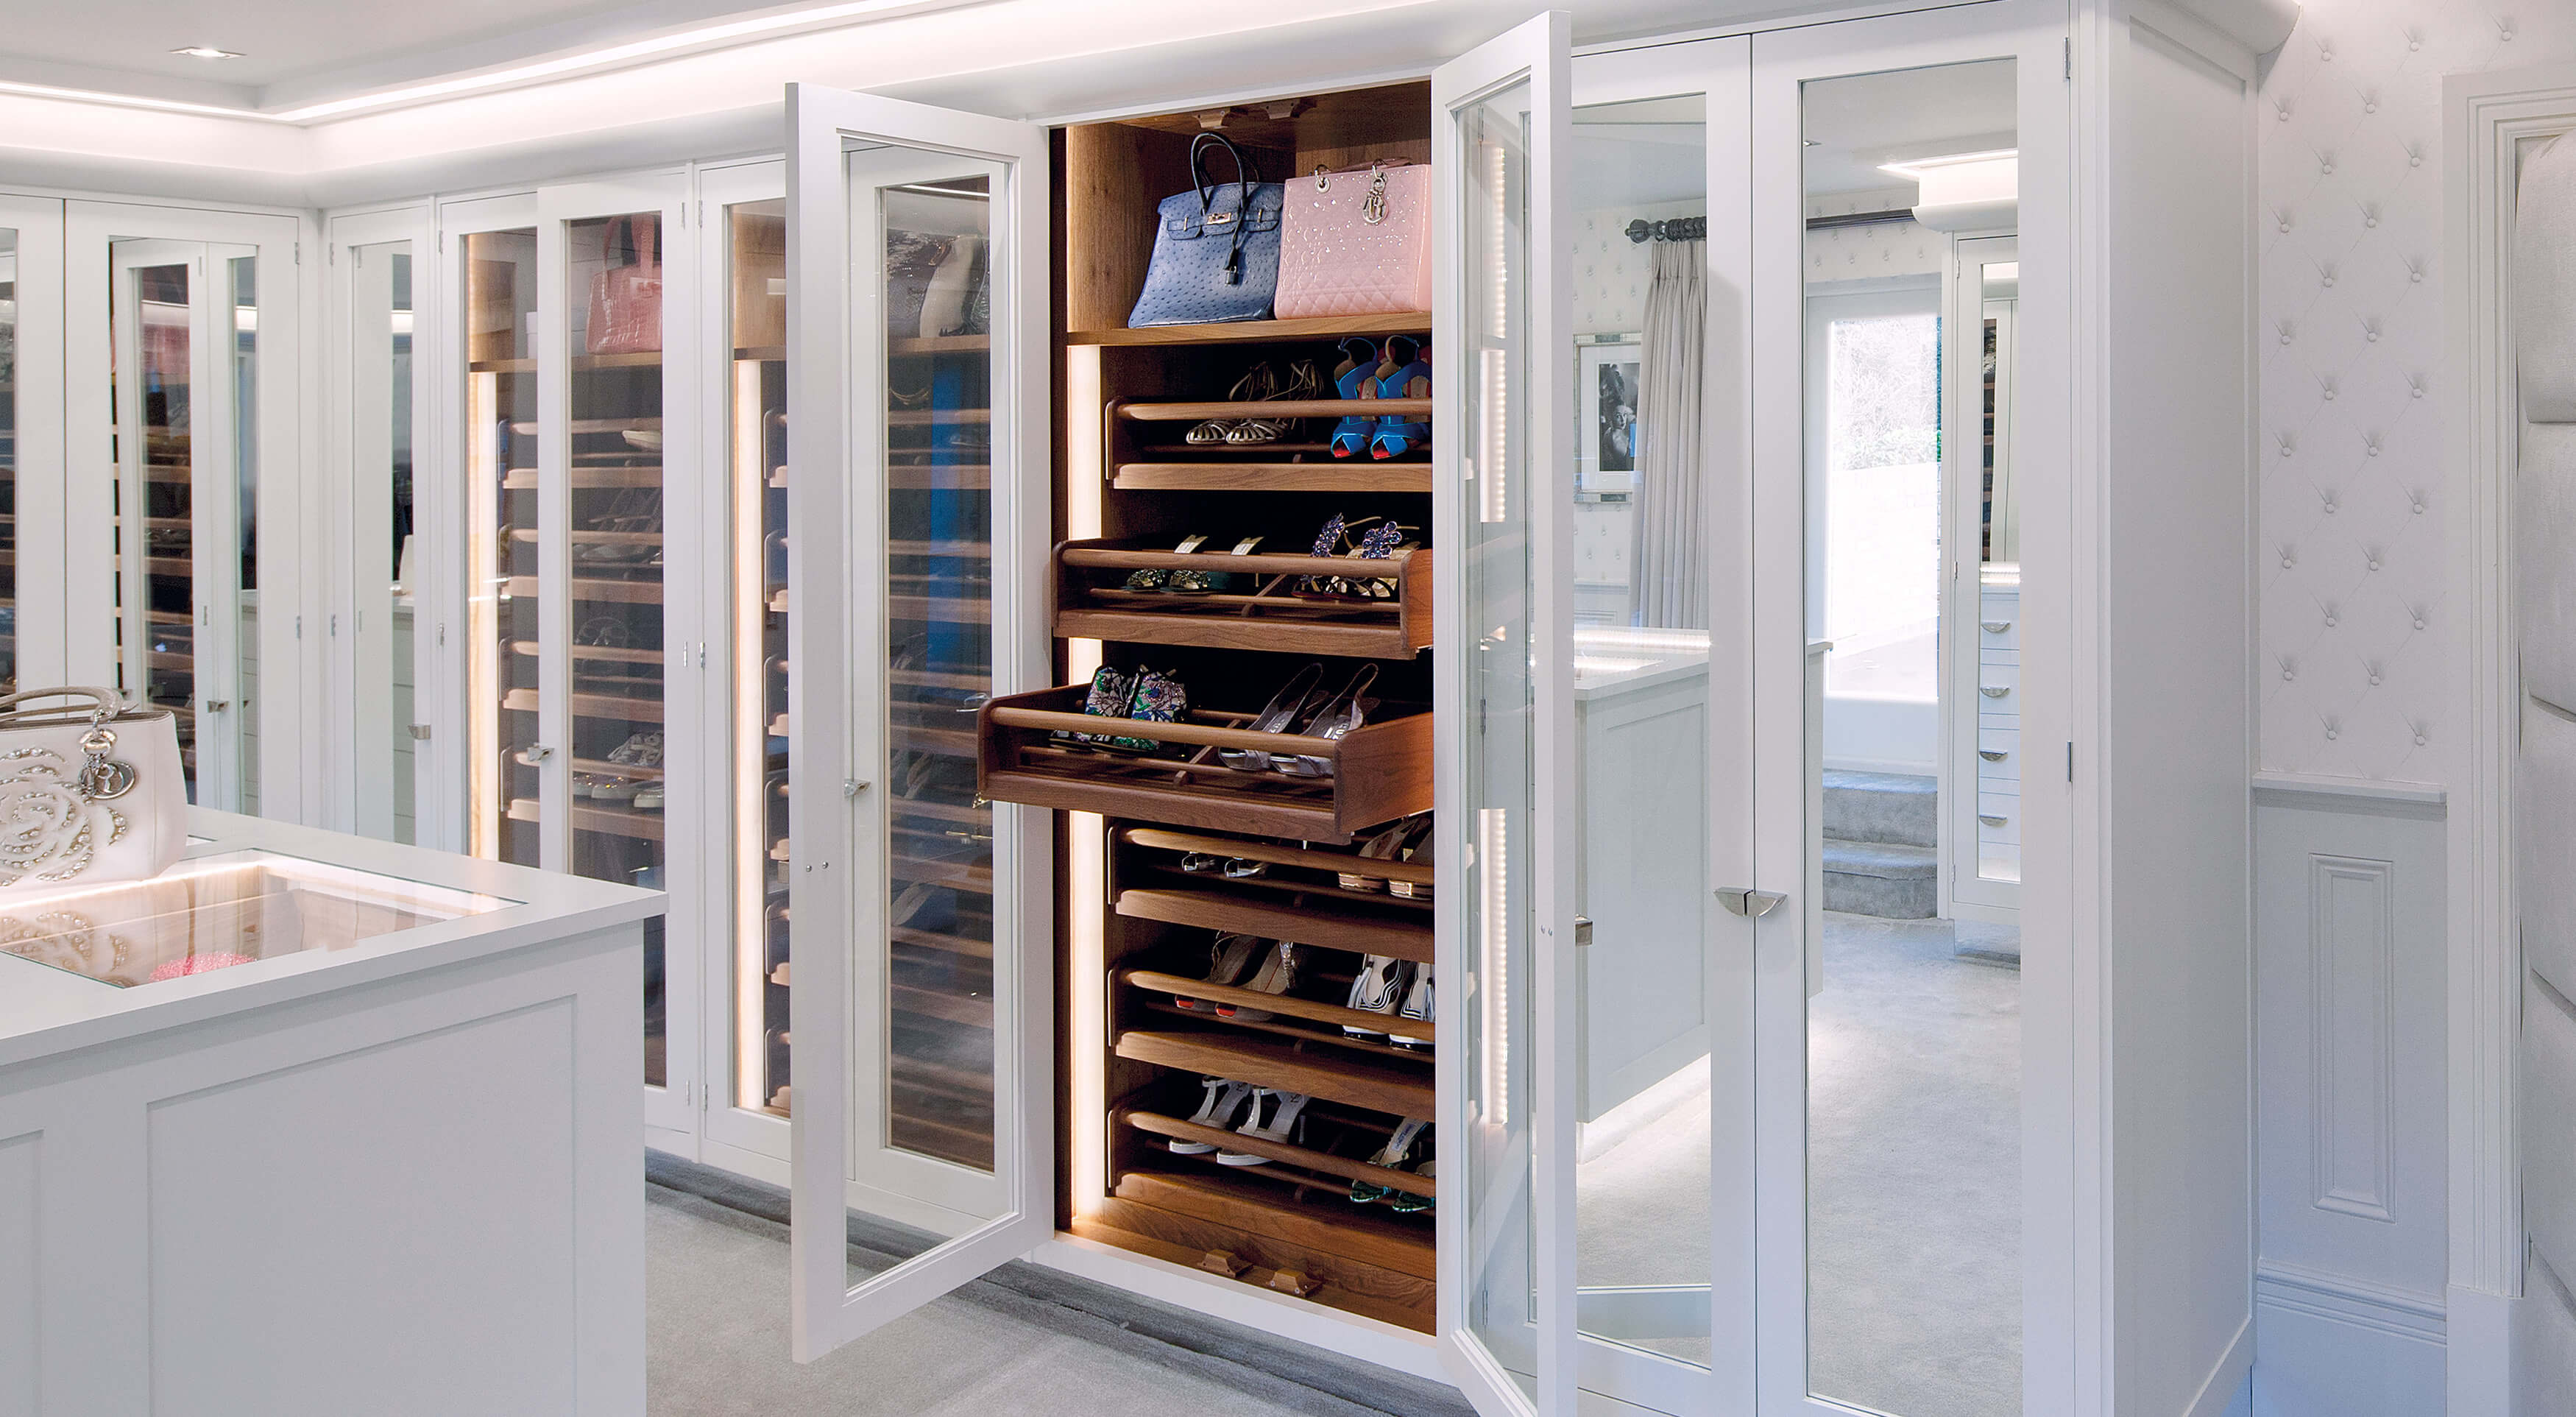 Bespoke white dressing room furniture by Smallbone